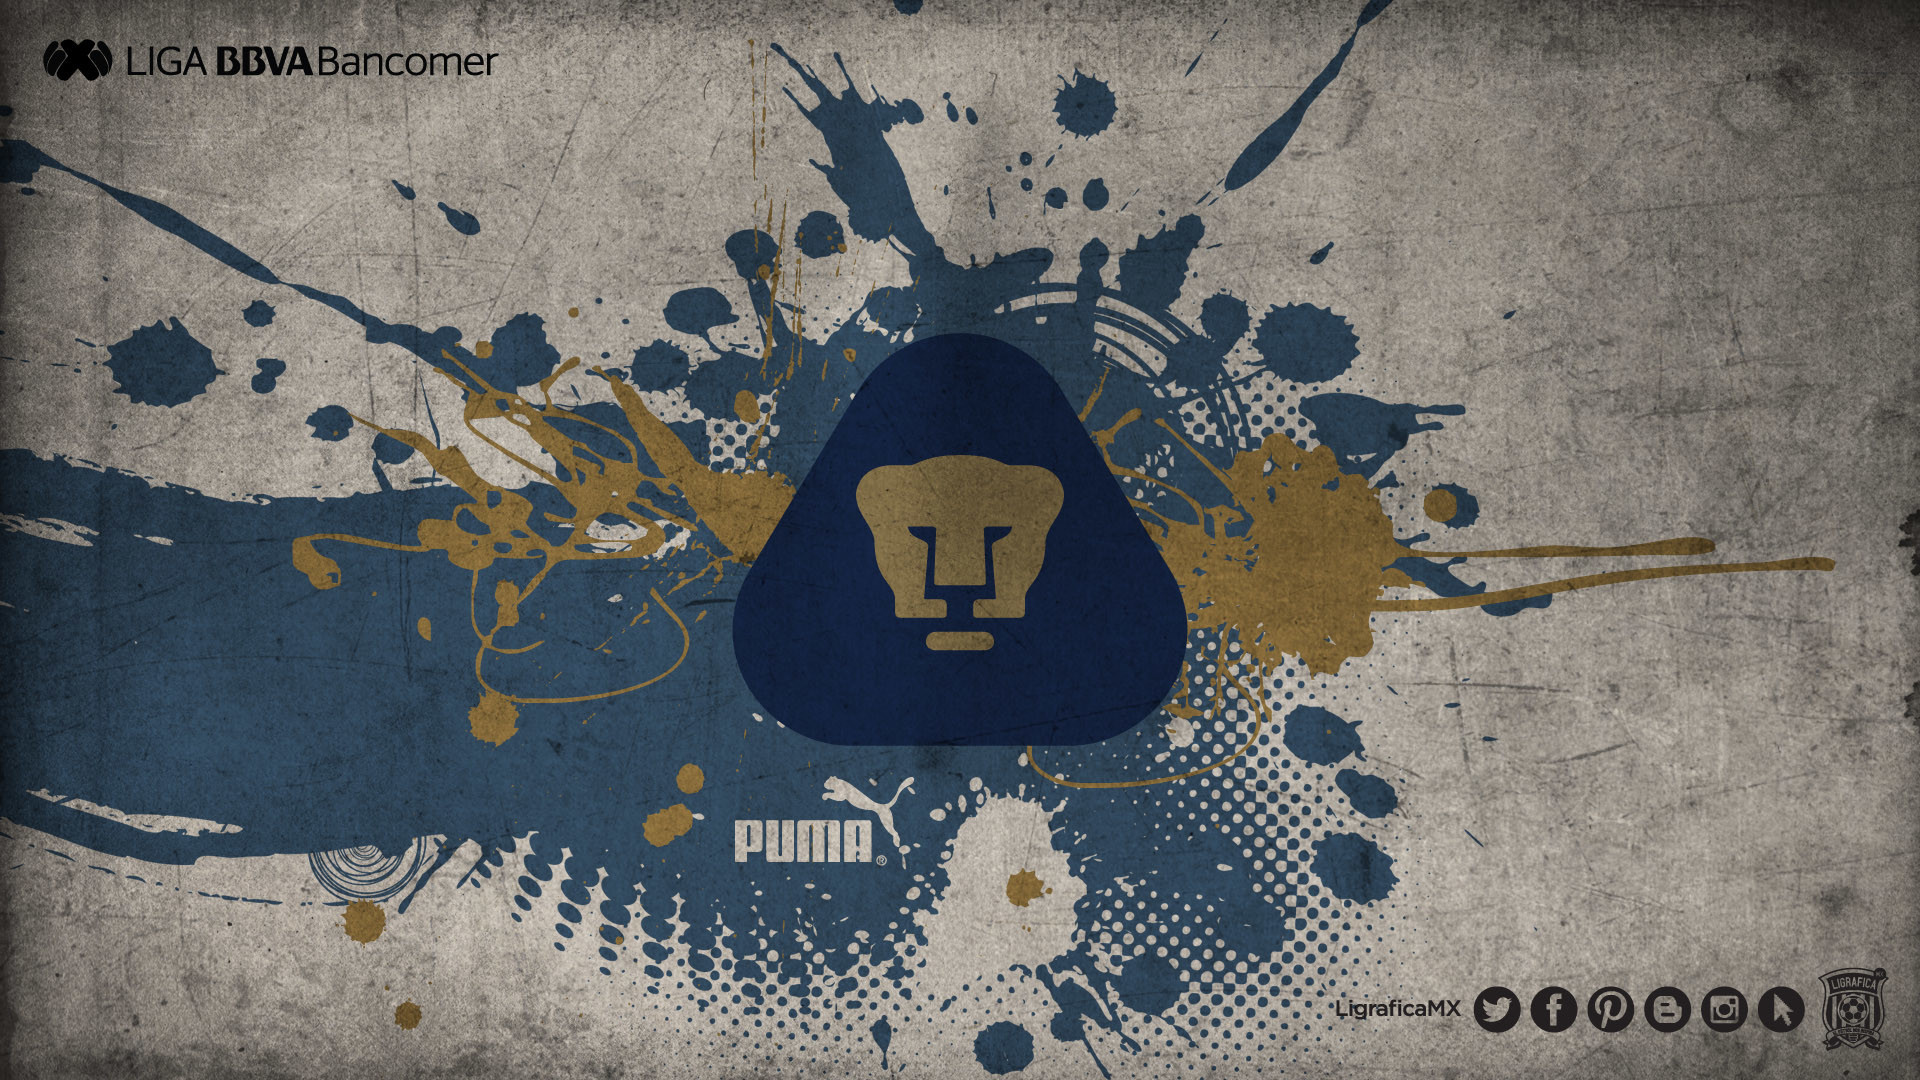 puma wallpaper iphone - HD1920×1080